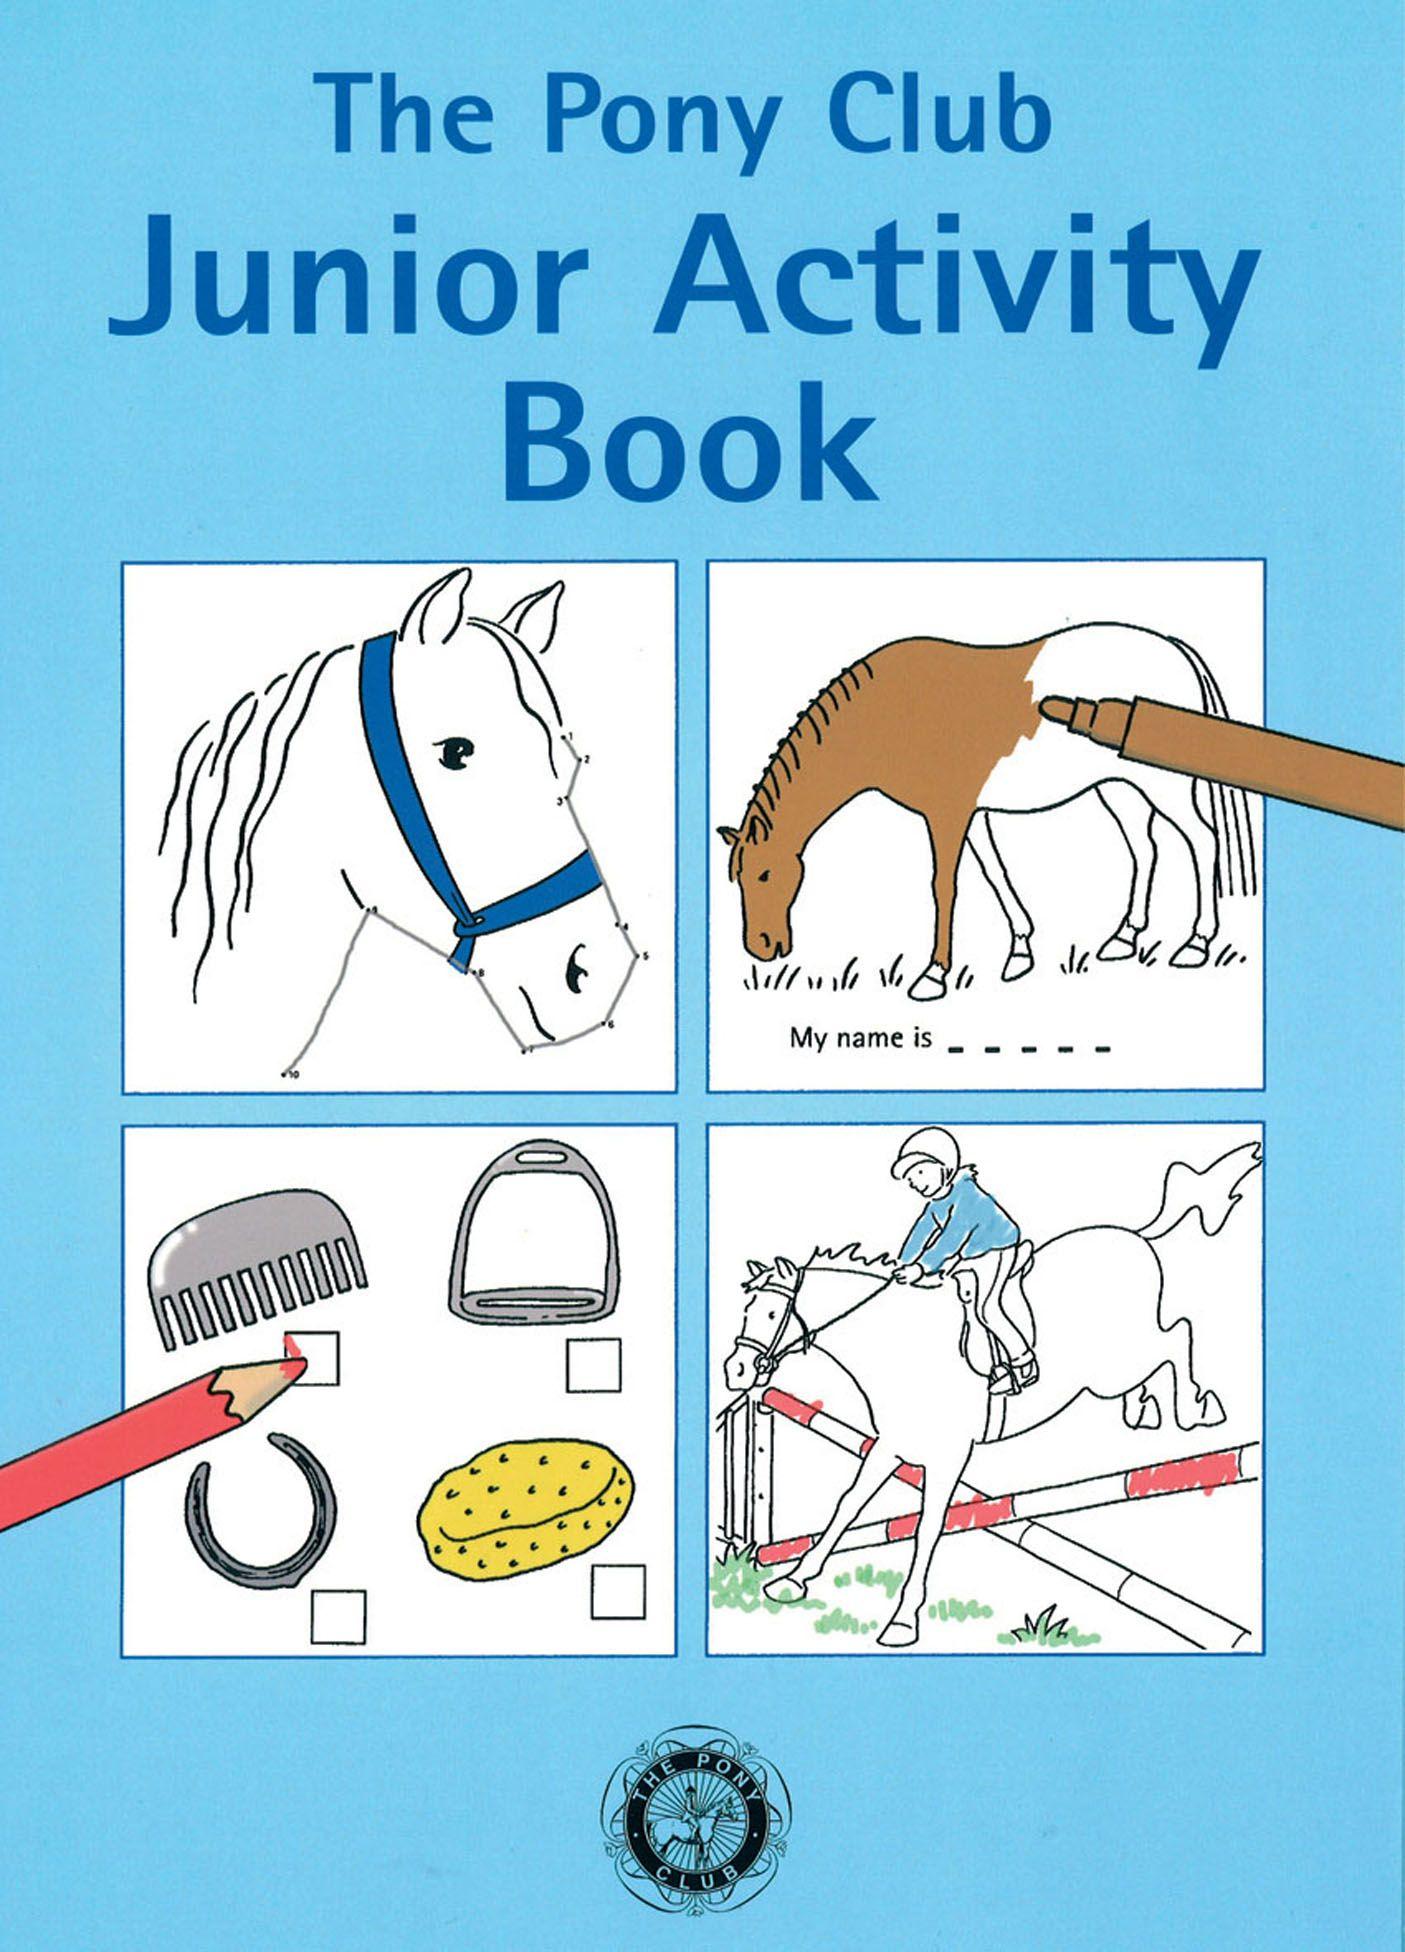 The Pony Club Junior Activity Book